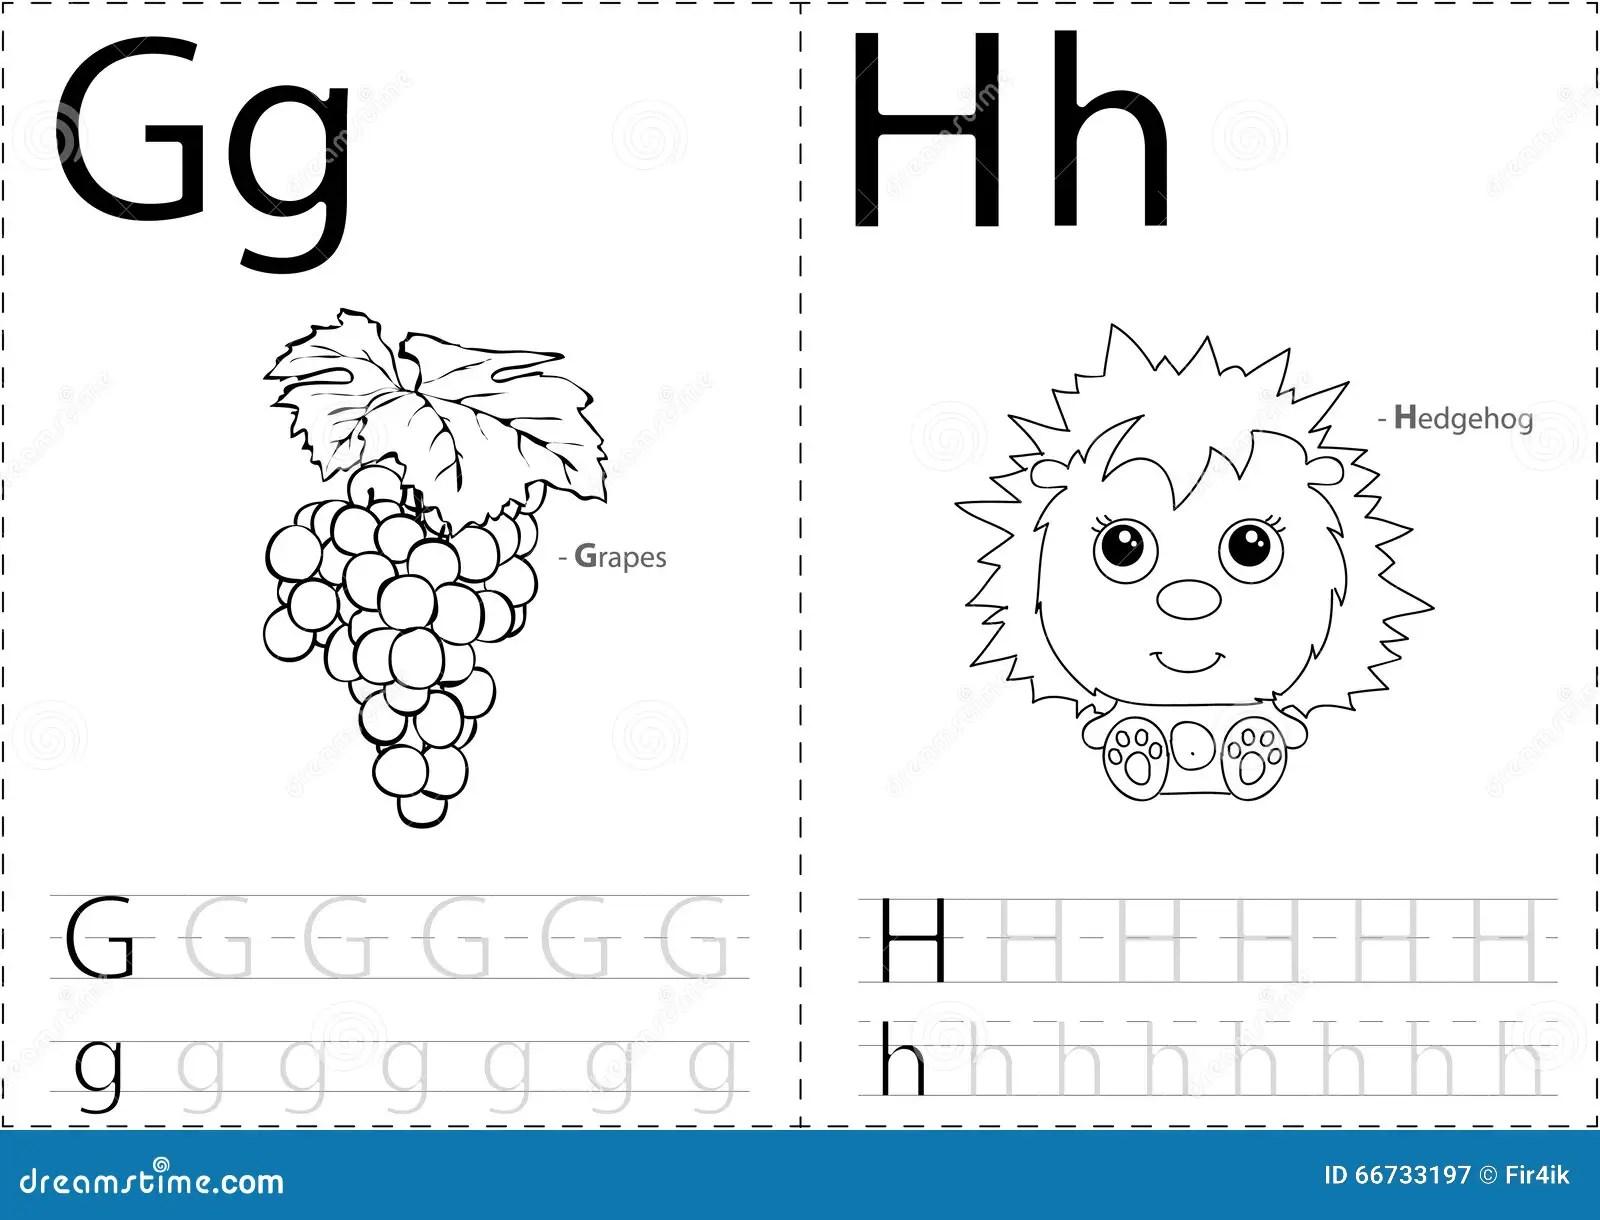 Cartoon G S And Hedgehog Alphabet Tracing Worksheet